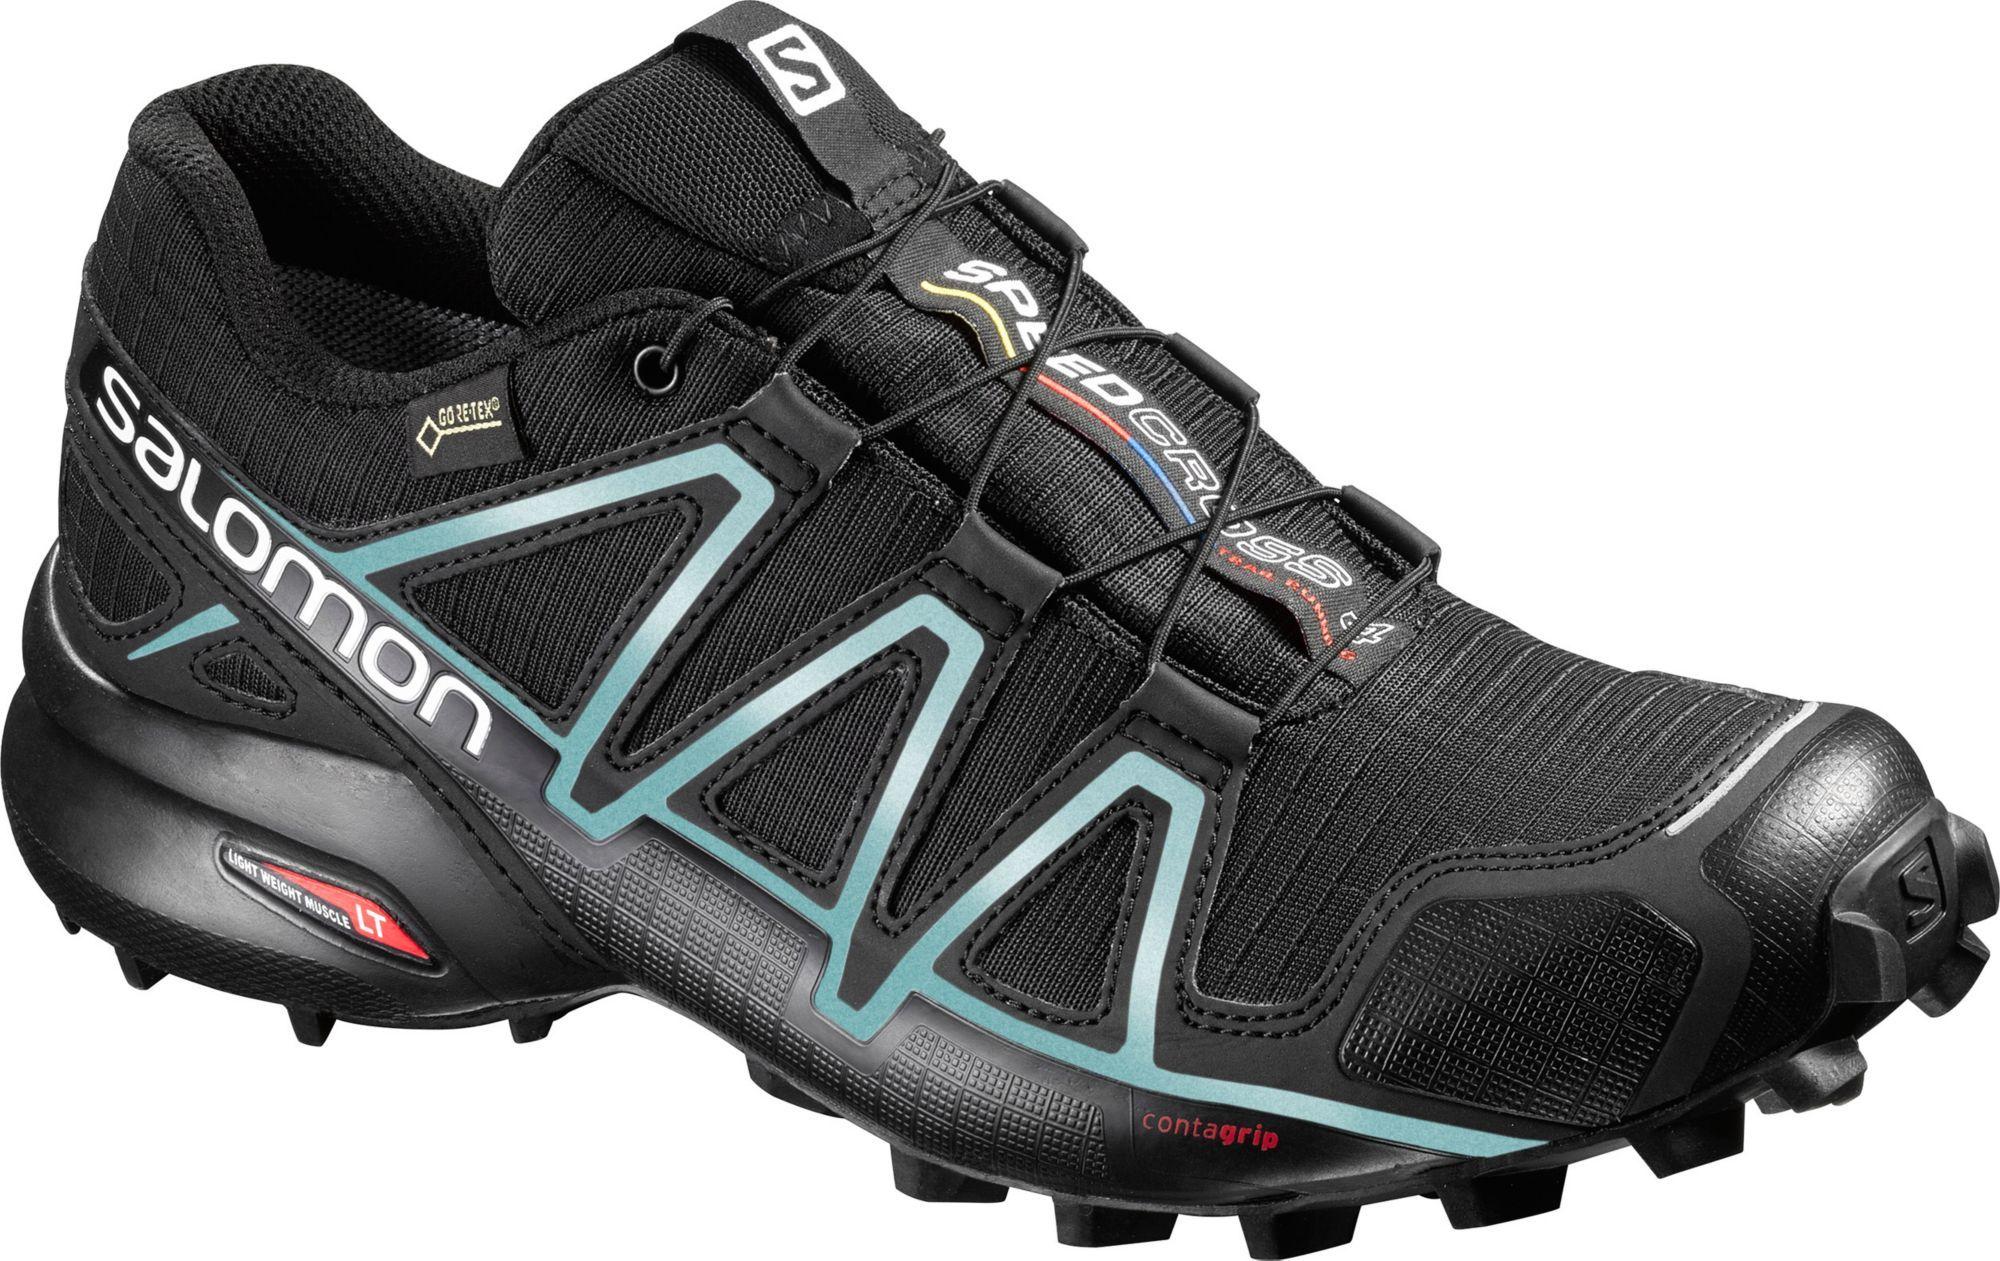 Salomona Women S Speedcross 4 Gtx Waterproof Trail Running Shoes Size 10 5 Black Trail Running Shoes Women Mens Trail Running Shoes Running Shoes